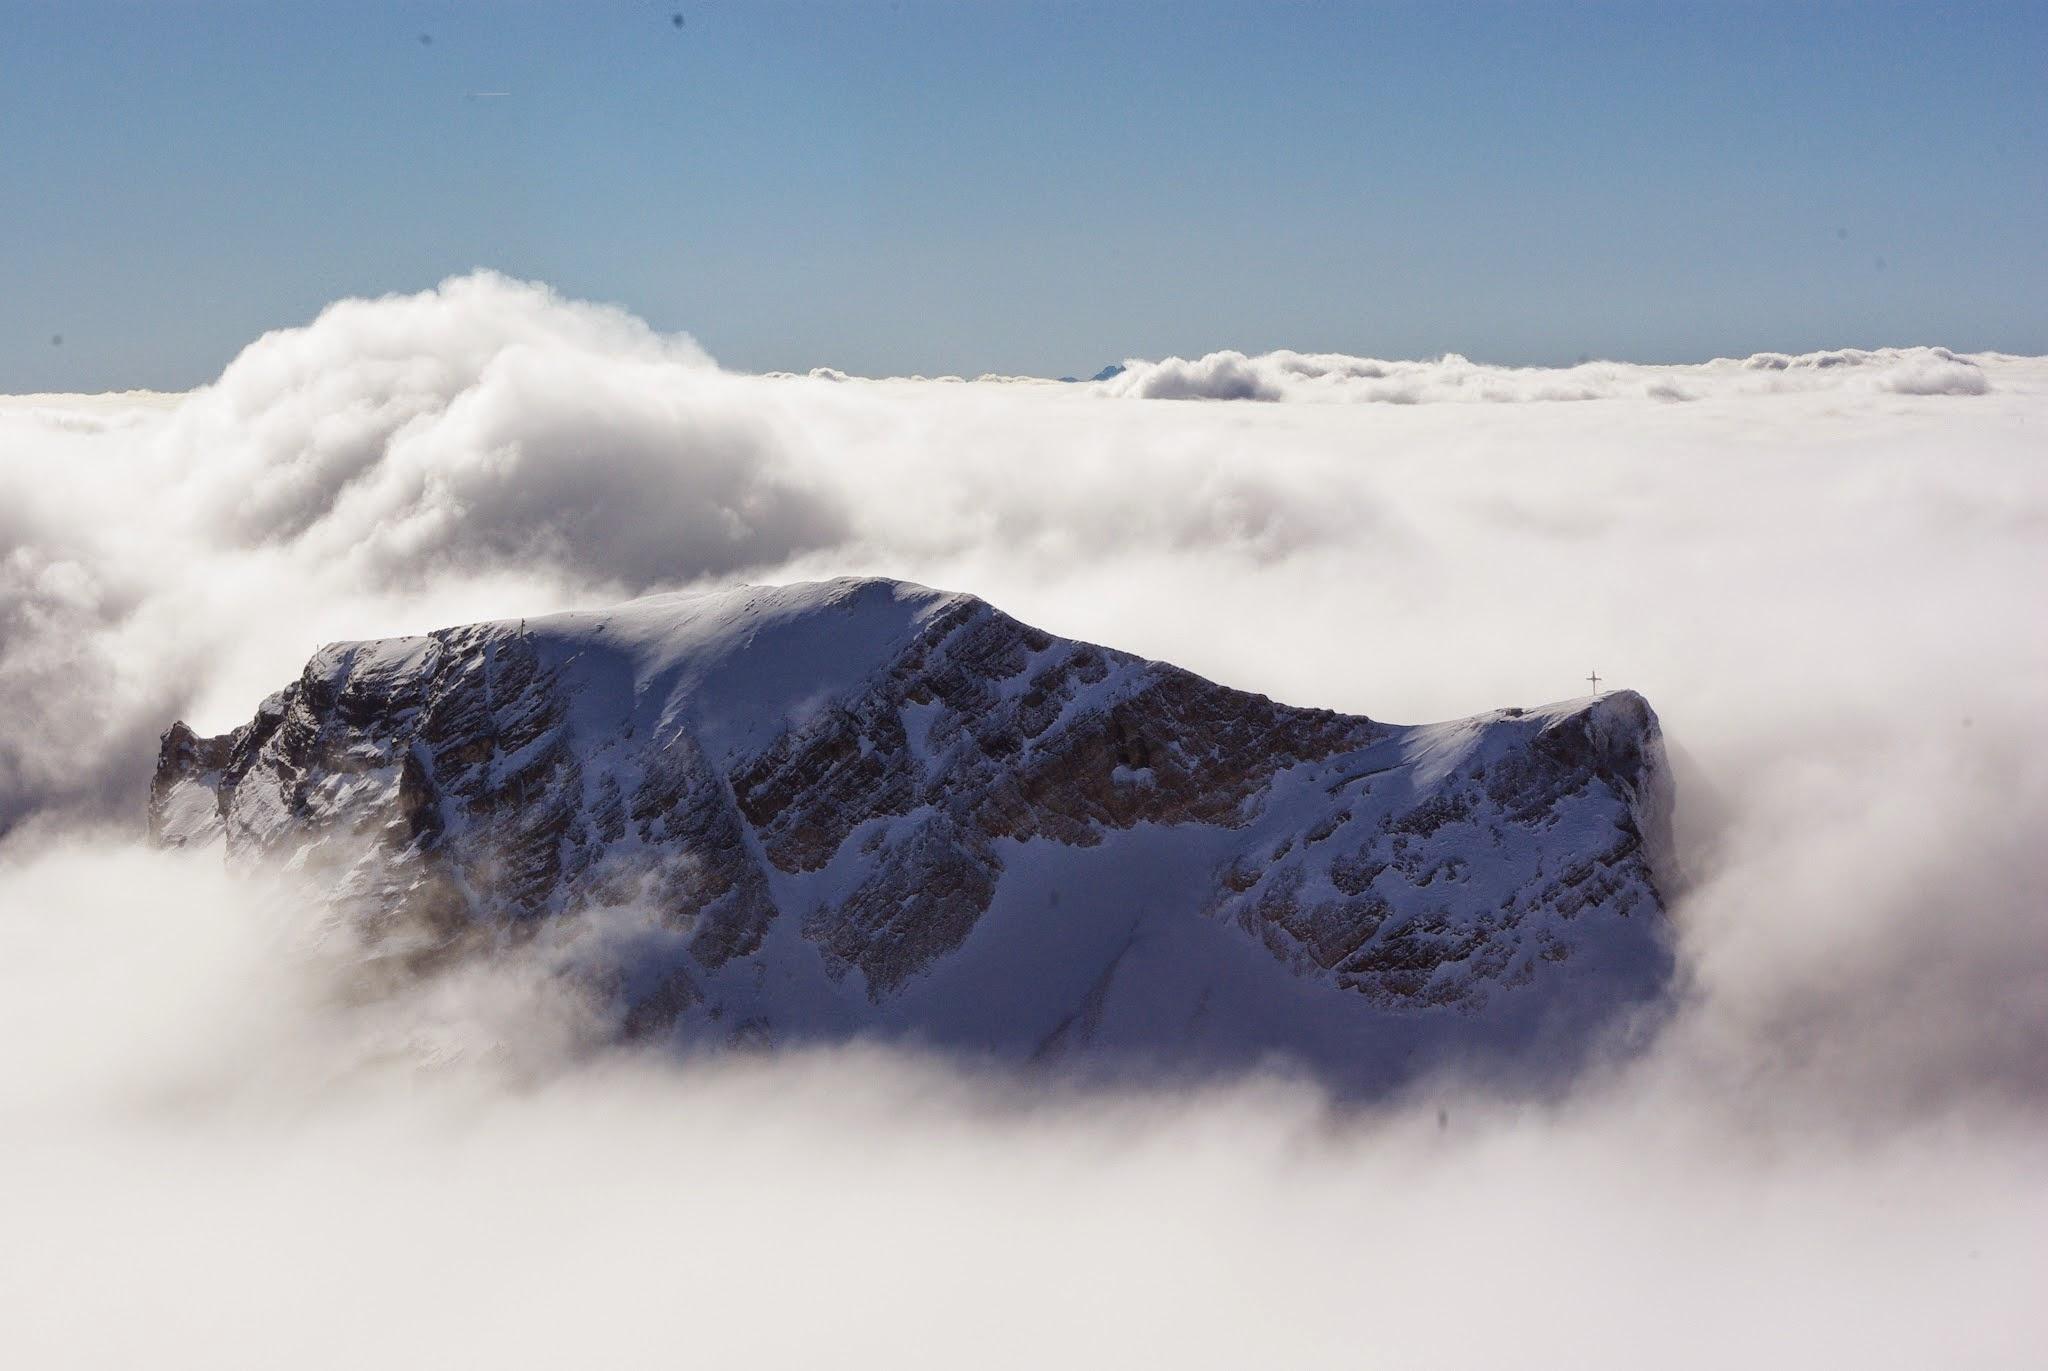 A nearby peak that  peek ed through the clouds.